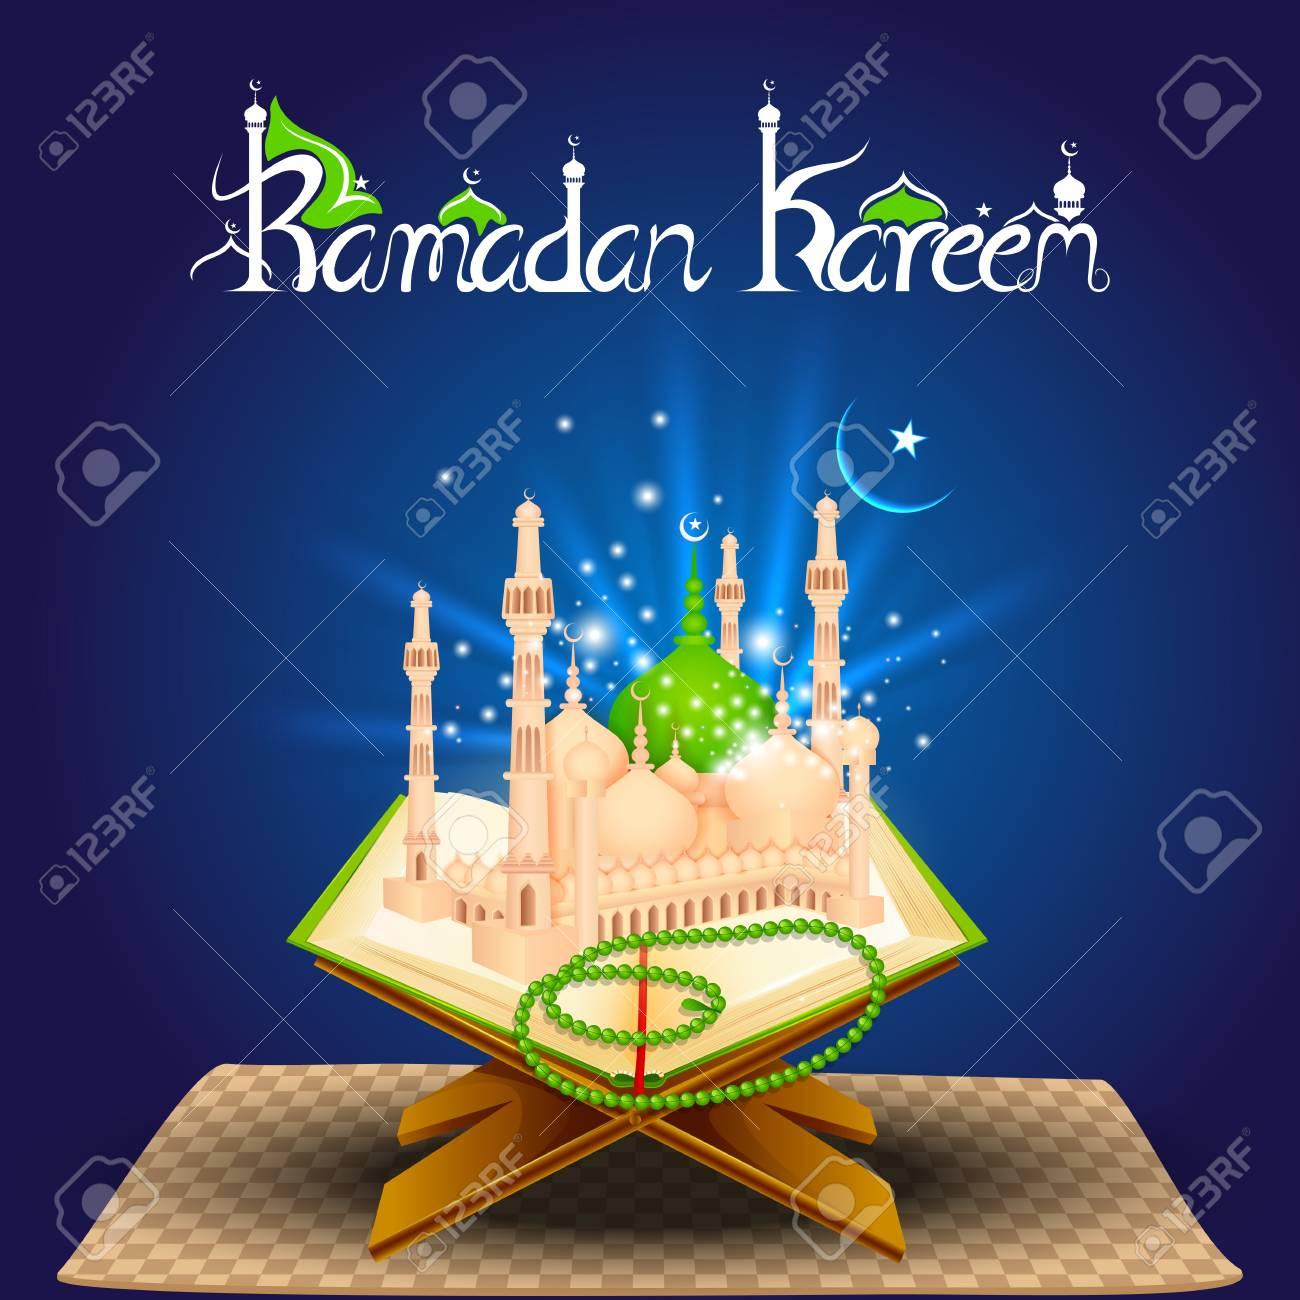 Vector Illustration Of Quran On Eid Mubarak Royalty Free Cliparts